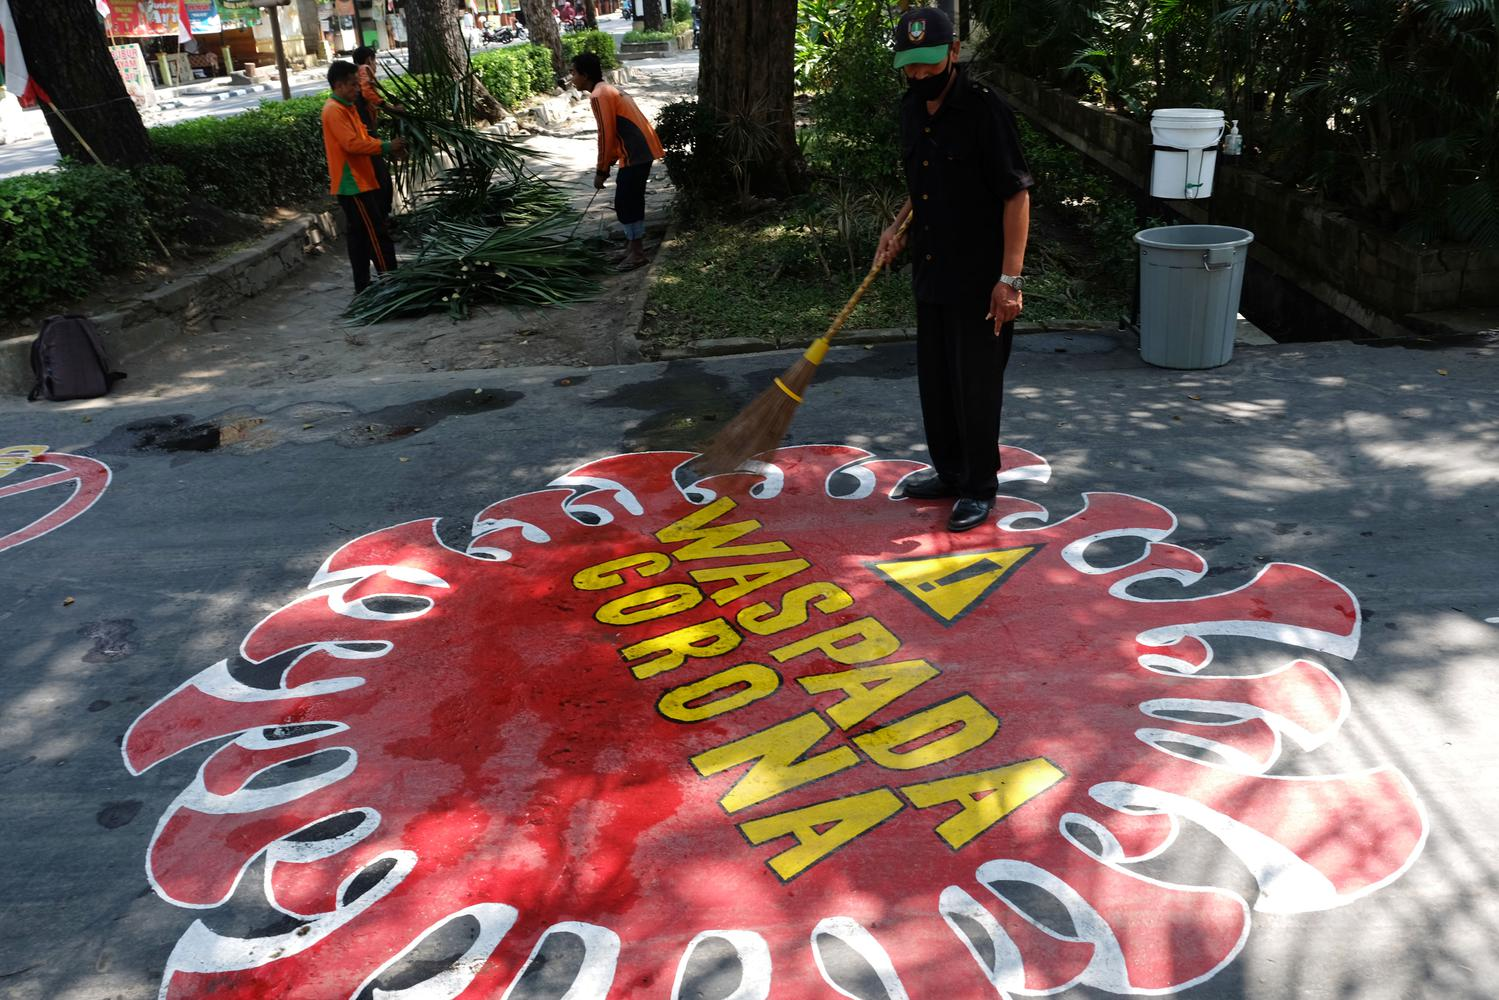 Pekerja membersihkan jalan yang terdapat mural berisi pesan Waspada Penyebaran Virus Corona di halaman Kantor Dinas Lingkungan Hidup, Solo, Jawa Tengah, Senin (3/8/2020). Mural tersebut dibuat agar pengguna jalan mematuhi protokol kesehatan guna mencegah penyebaran COVID-19.